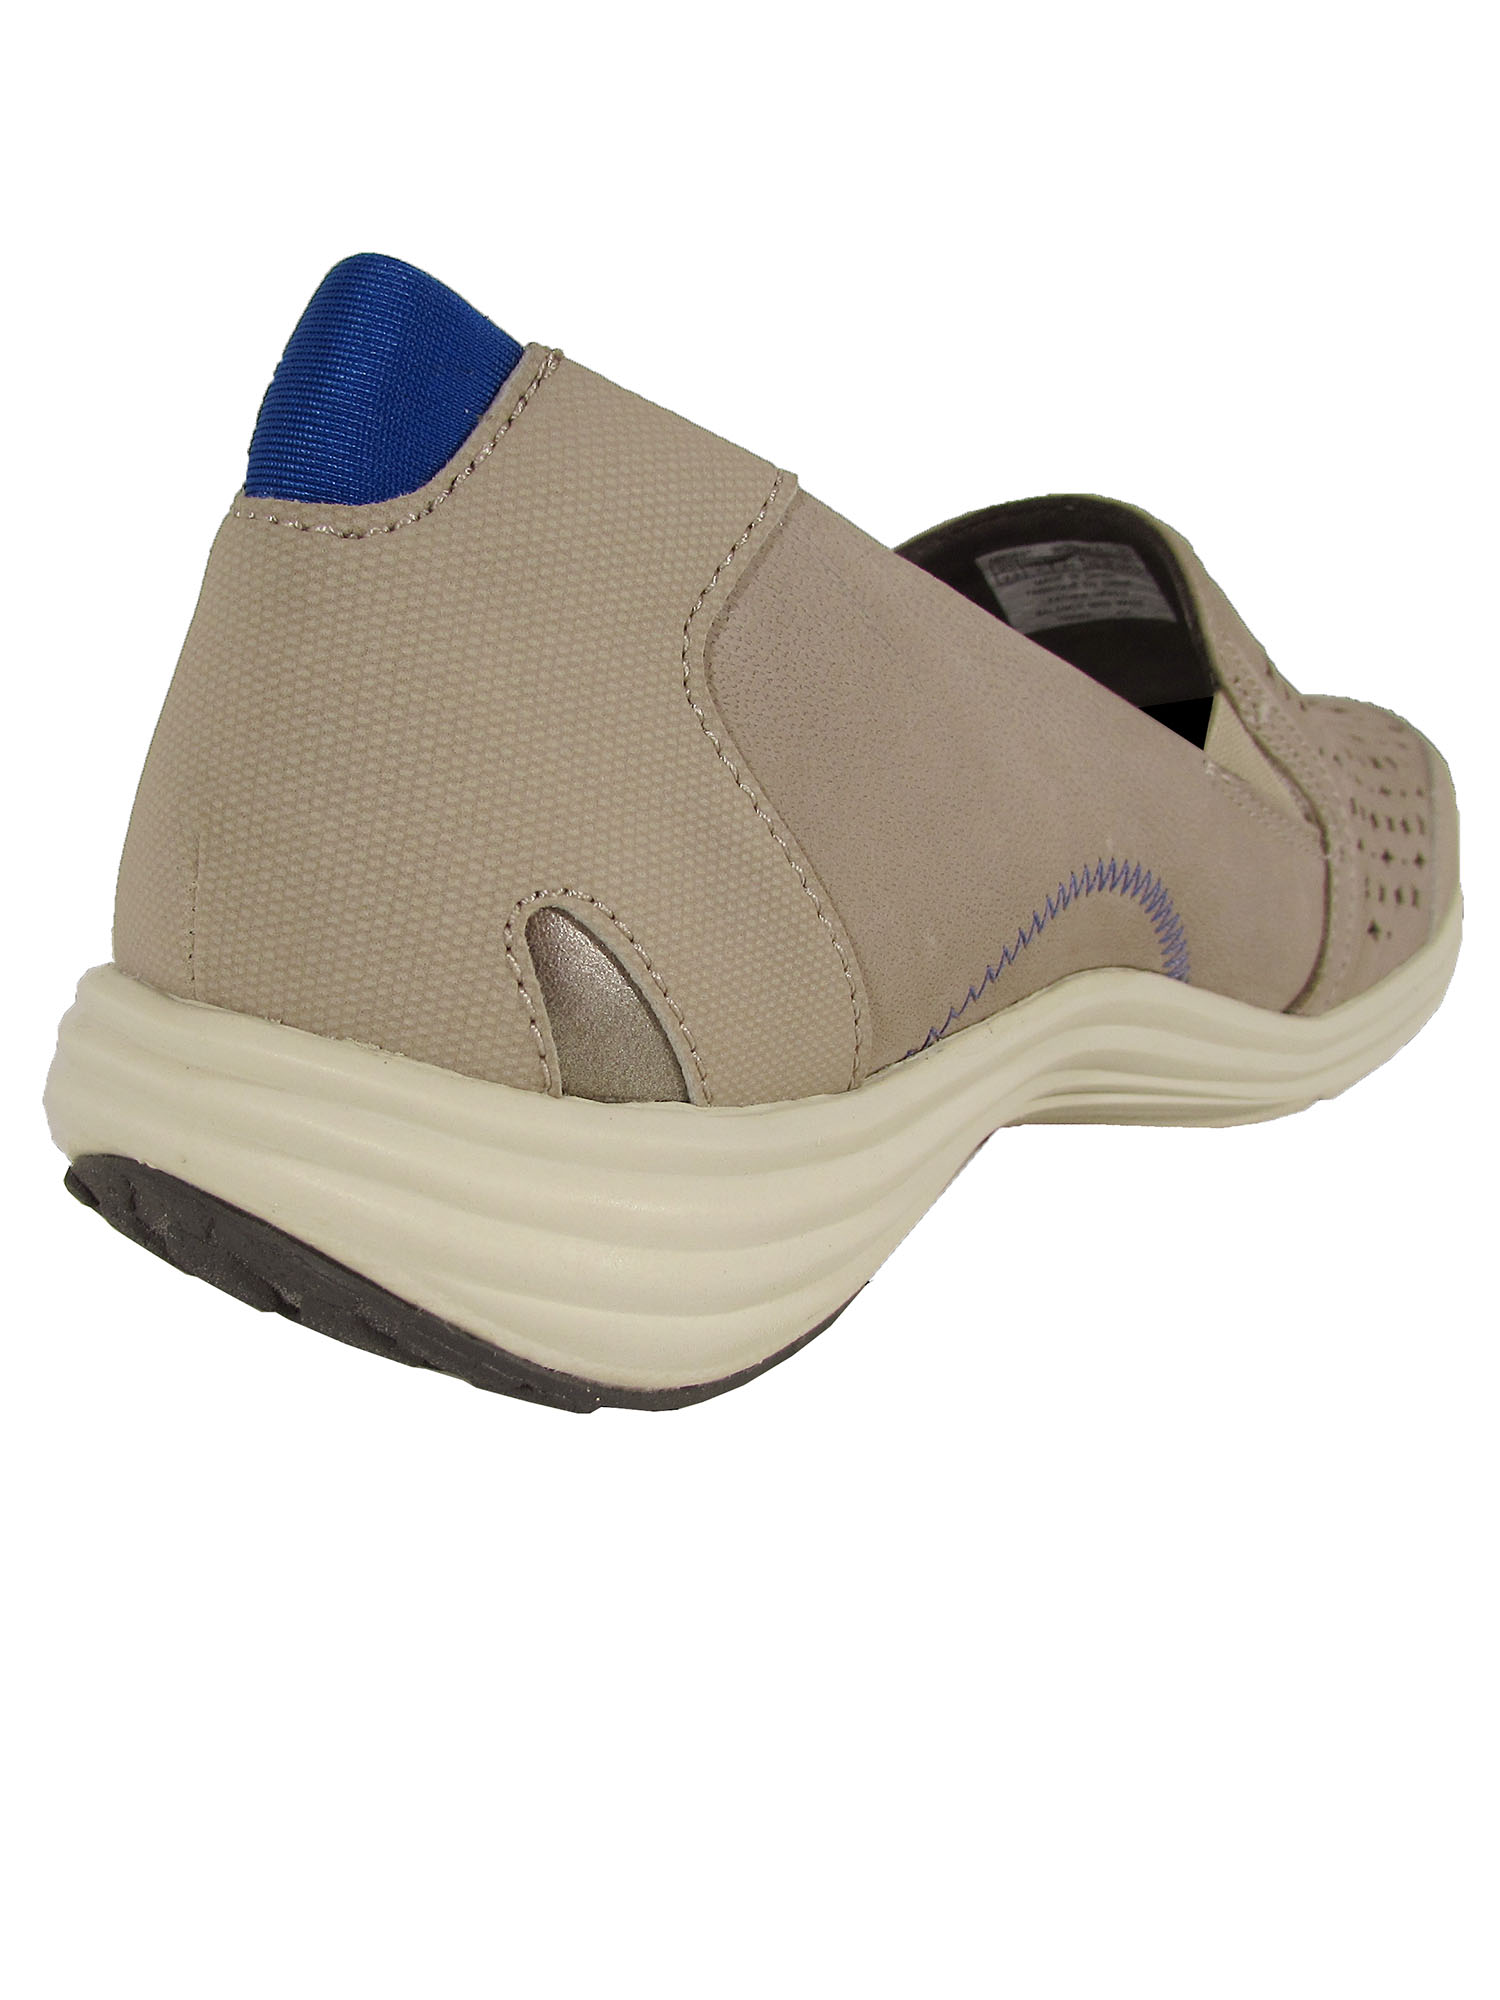 Aravon-Womens-Bonnie-AR-Slip-On-Loafer-Shoes miniatura 13